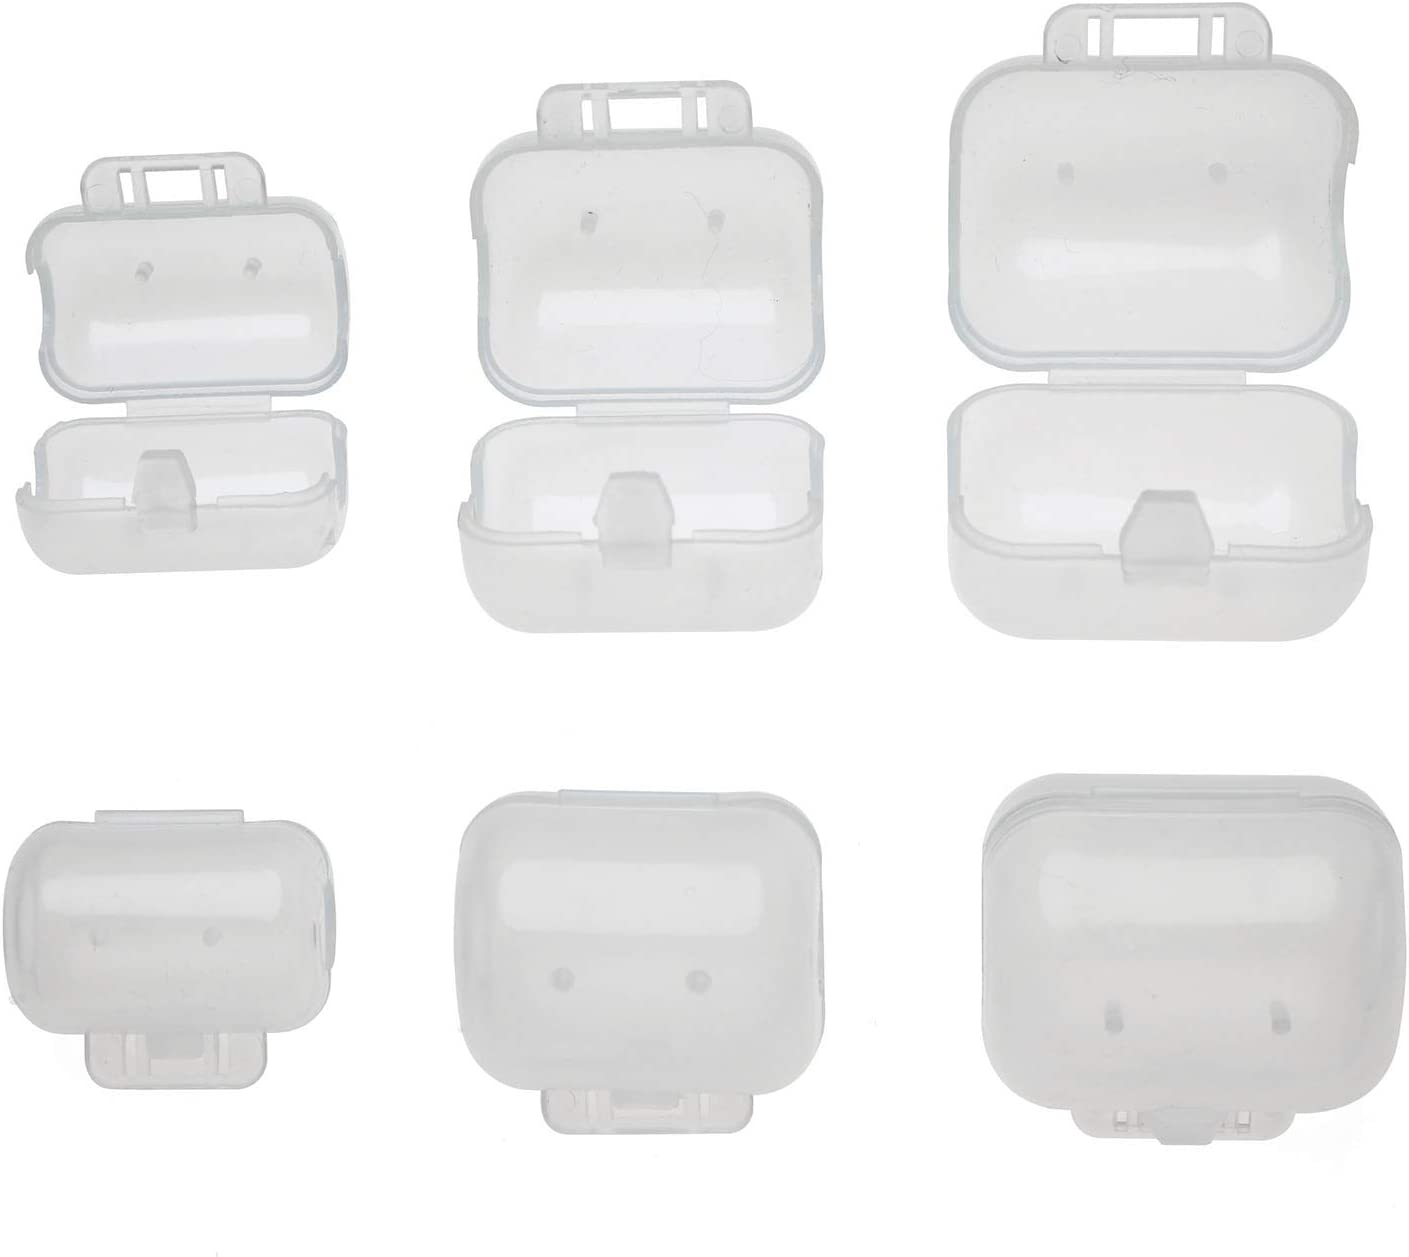 10 pcs Squid Jig Hook Protector Sleeve Storage Cover Accessories Fishing C1N1